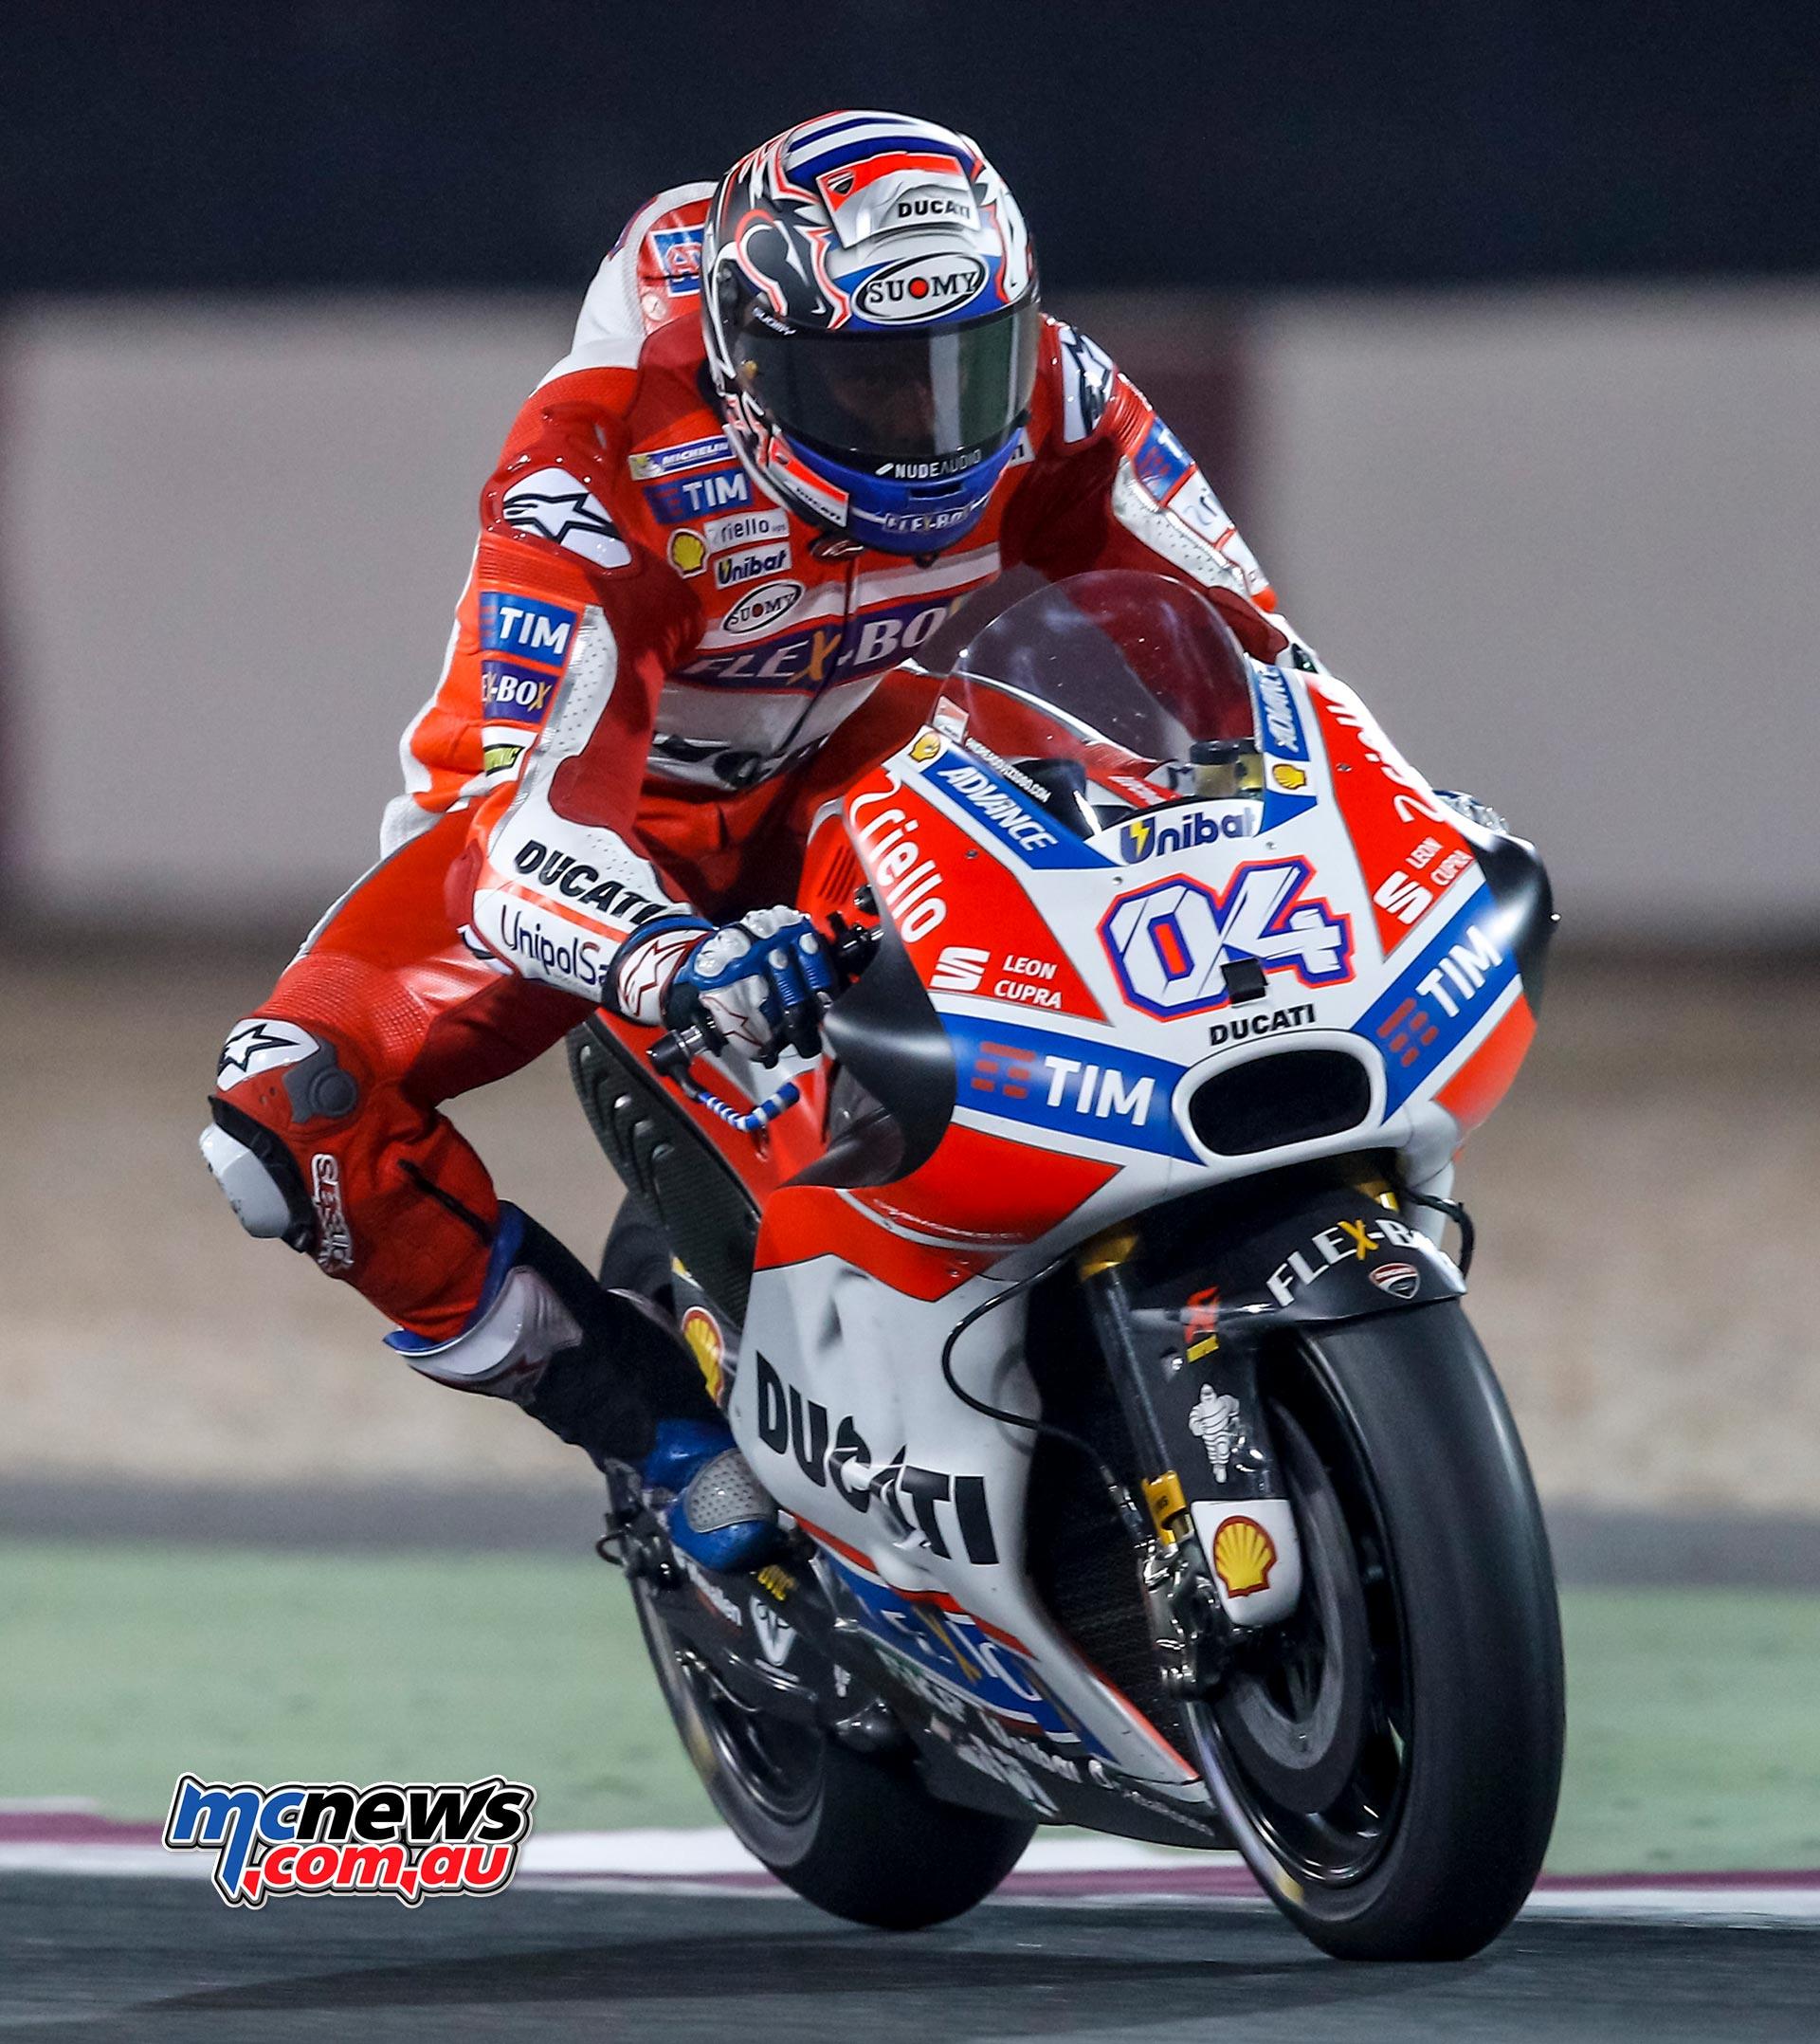 Motogp Qatar Race Stream | MotoGP 2017 Info, Video, Points Table